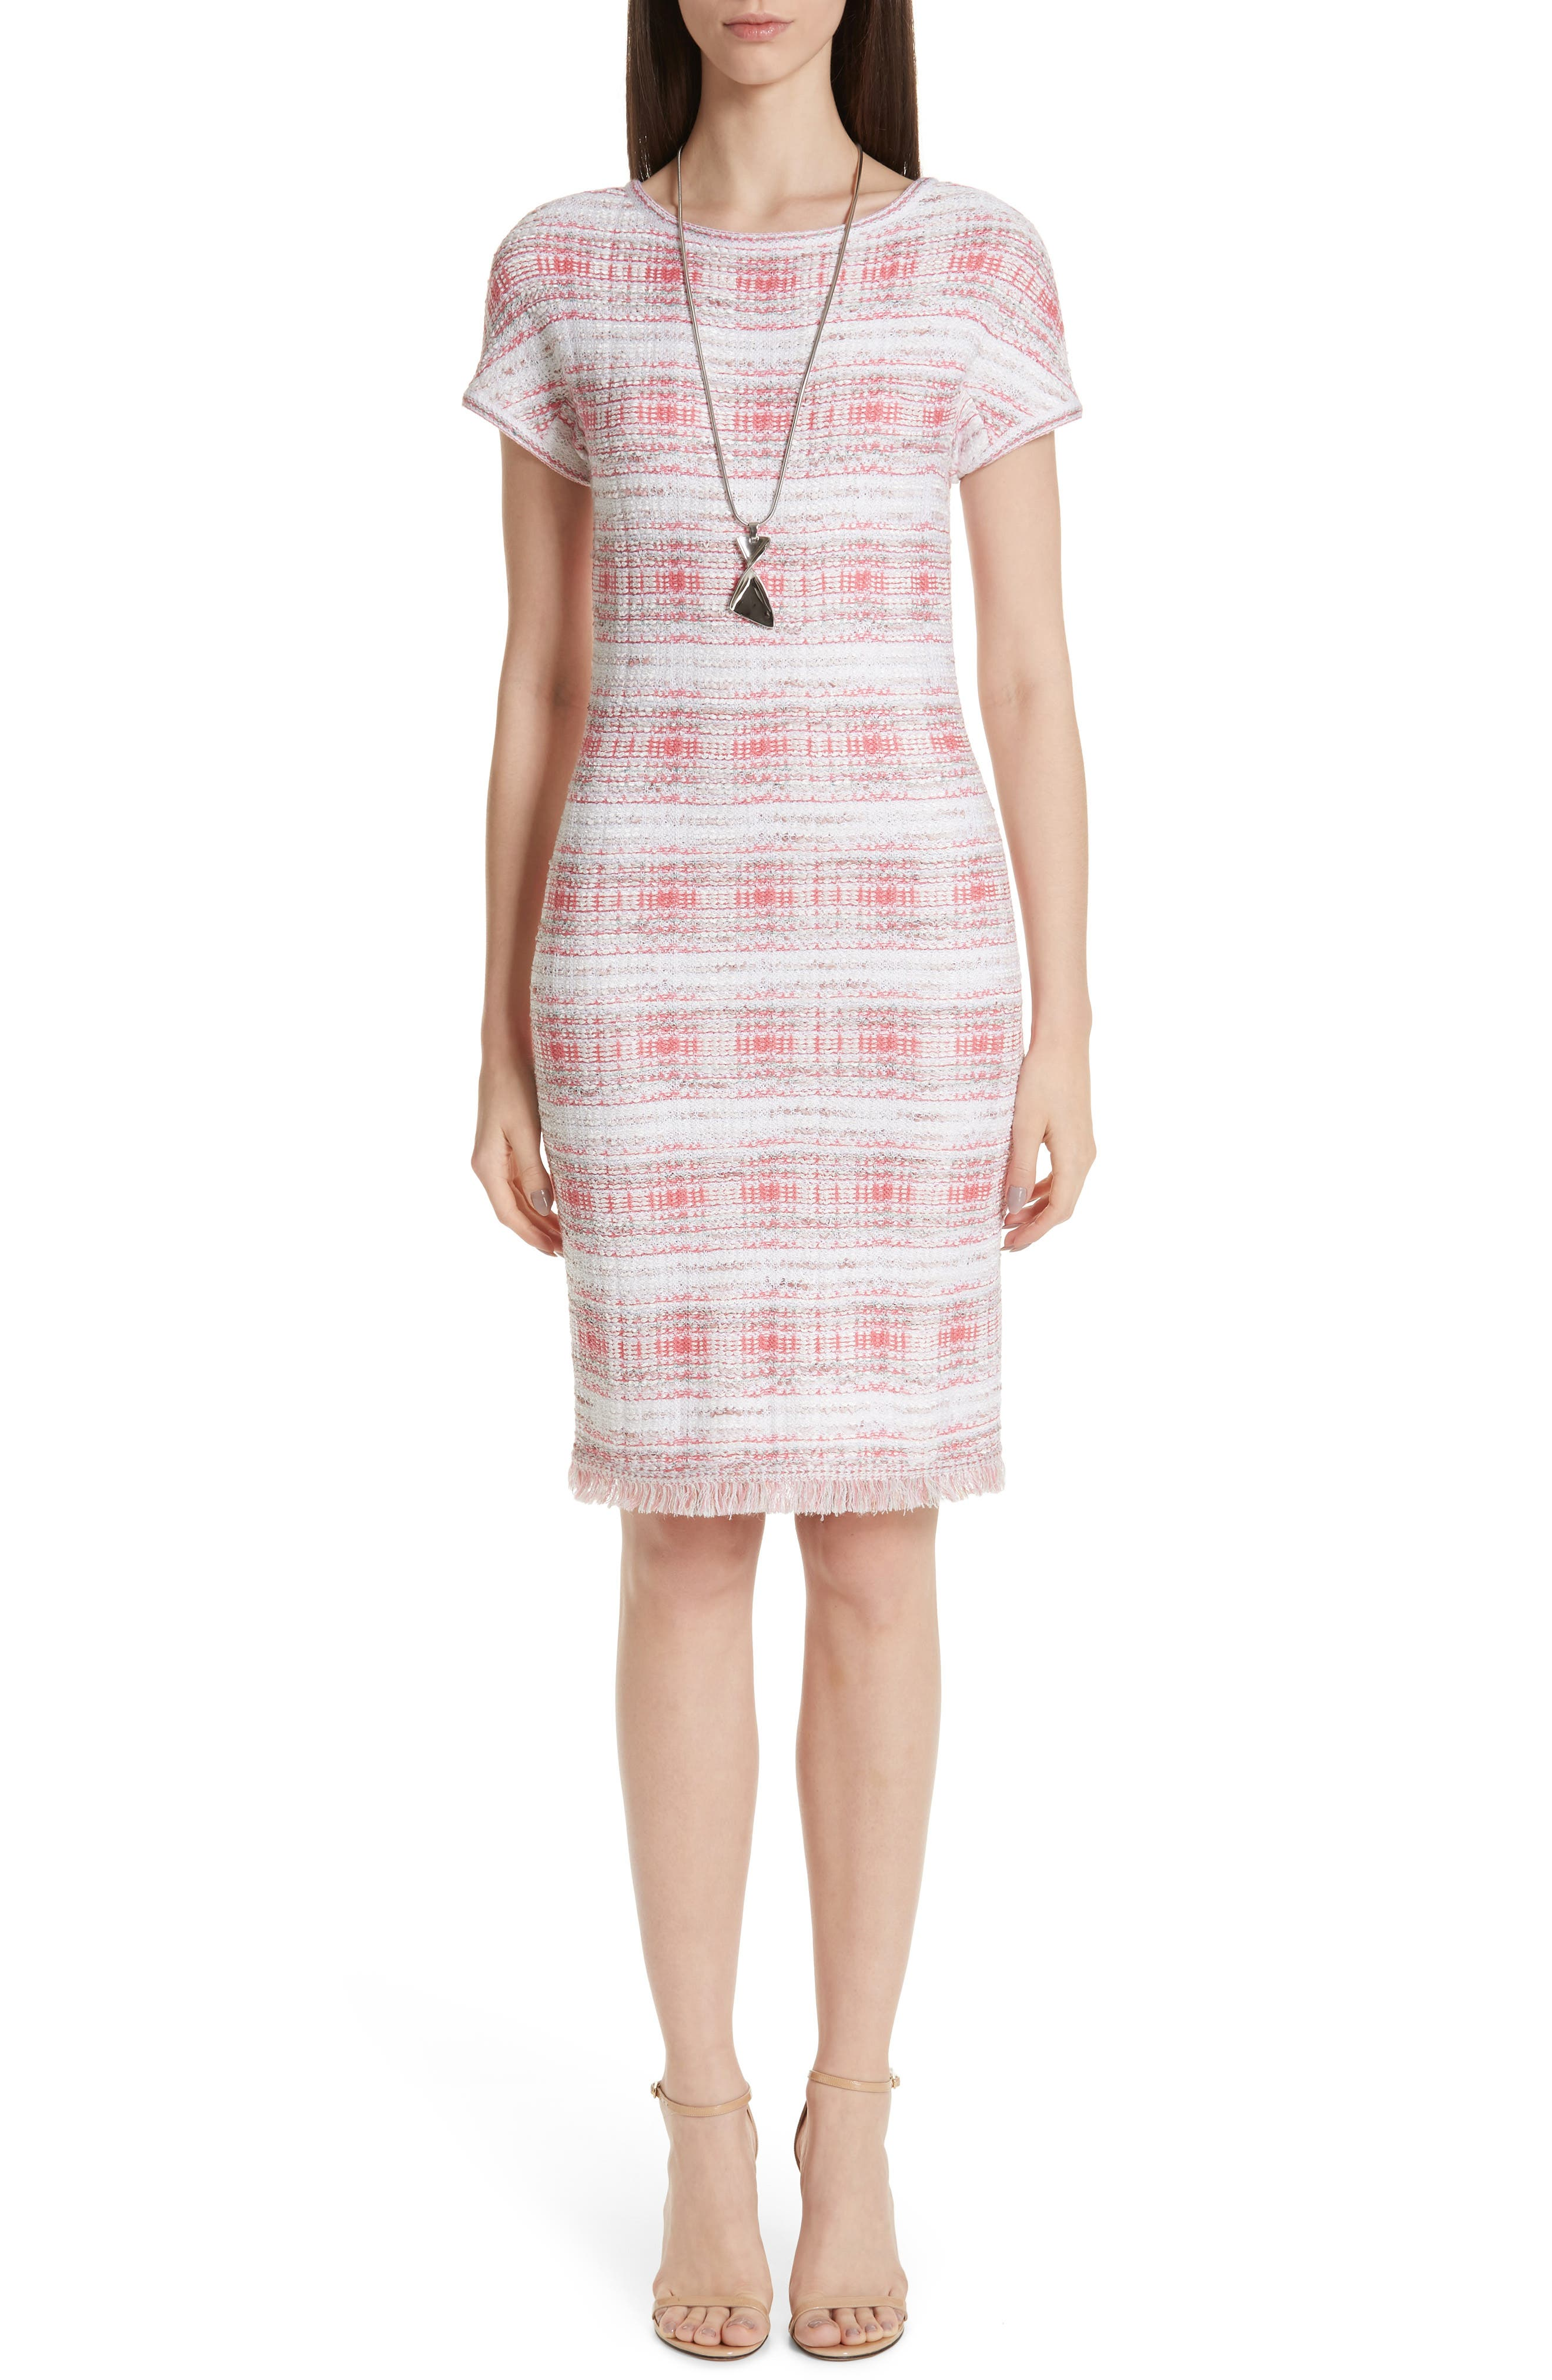 St. John Collection Becca Knit Short Sleeve Dress, Coral